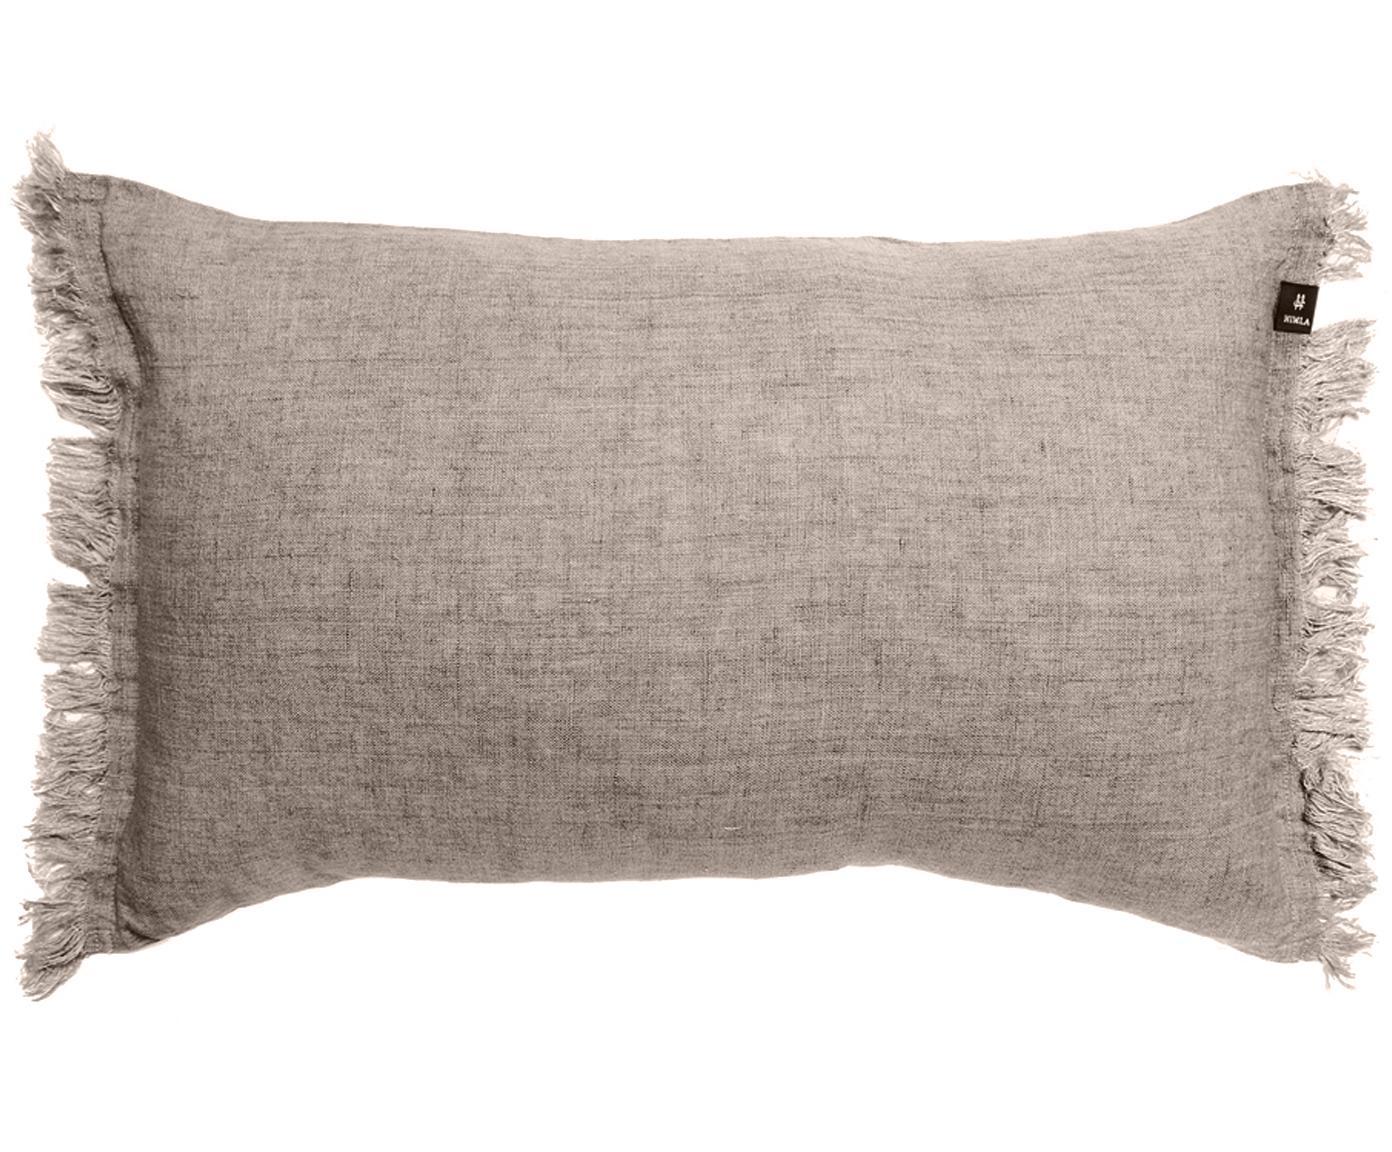 Cuscino in lino con frange Levelin, Beige, Larg. 40 x Lung. 60 cm